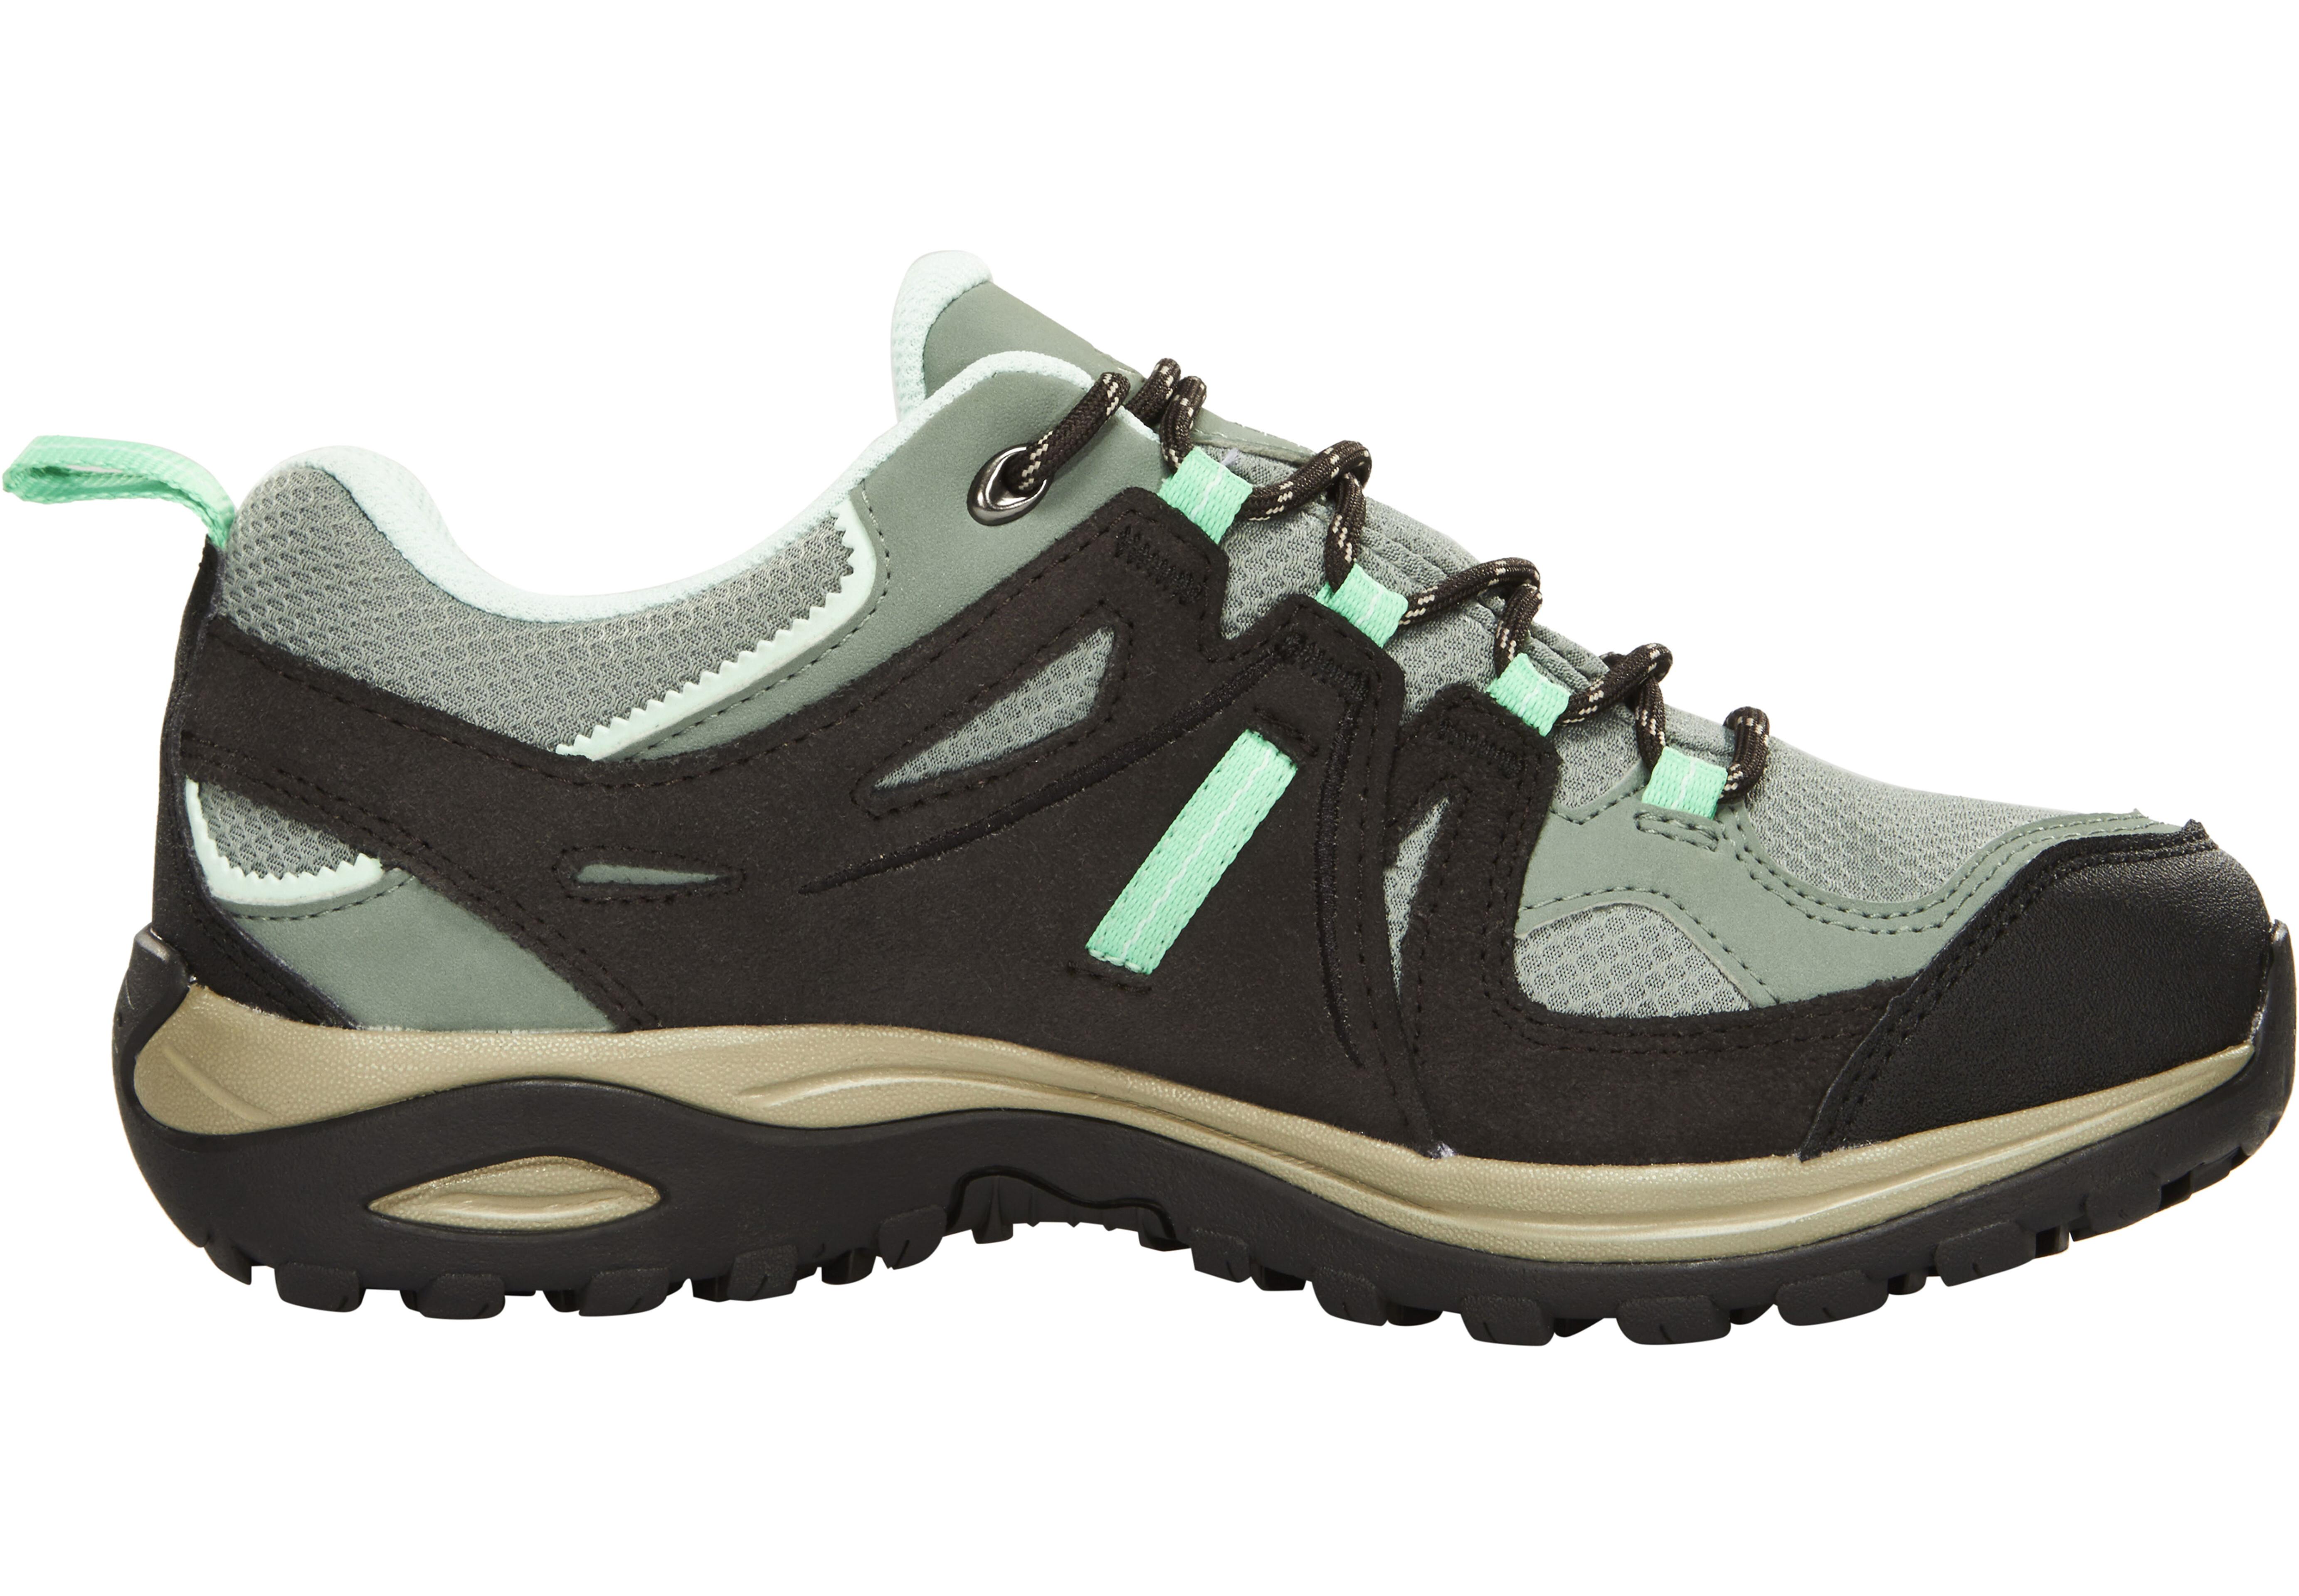 Lichte Wandelschoenen Dames : Salomon ellipse 2 gtx schoenen dames grijs turquoise l online bij